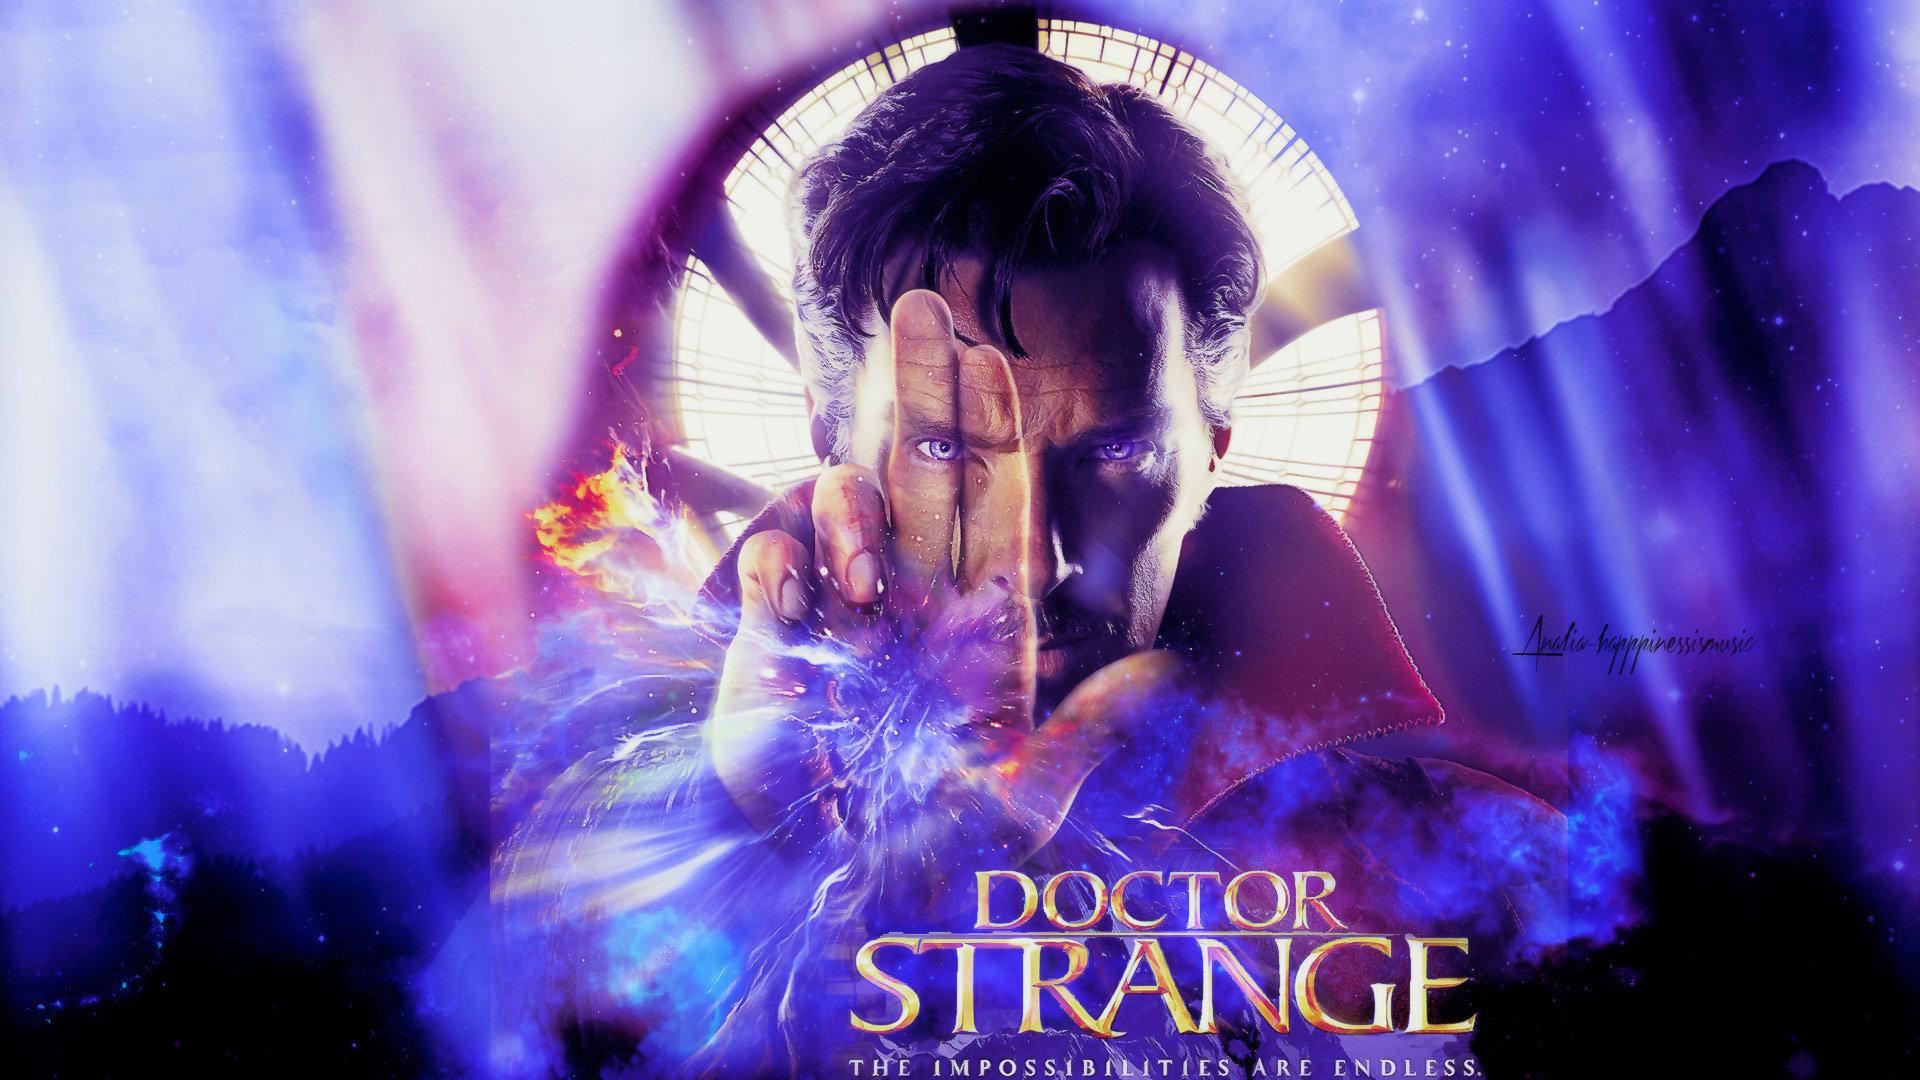 doctor strange hd movie download free